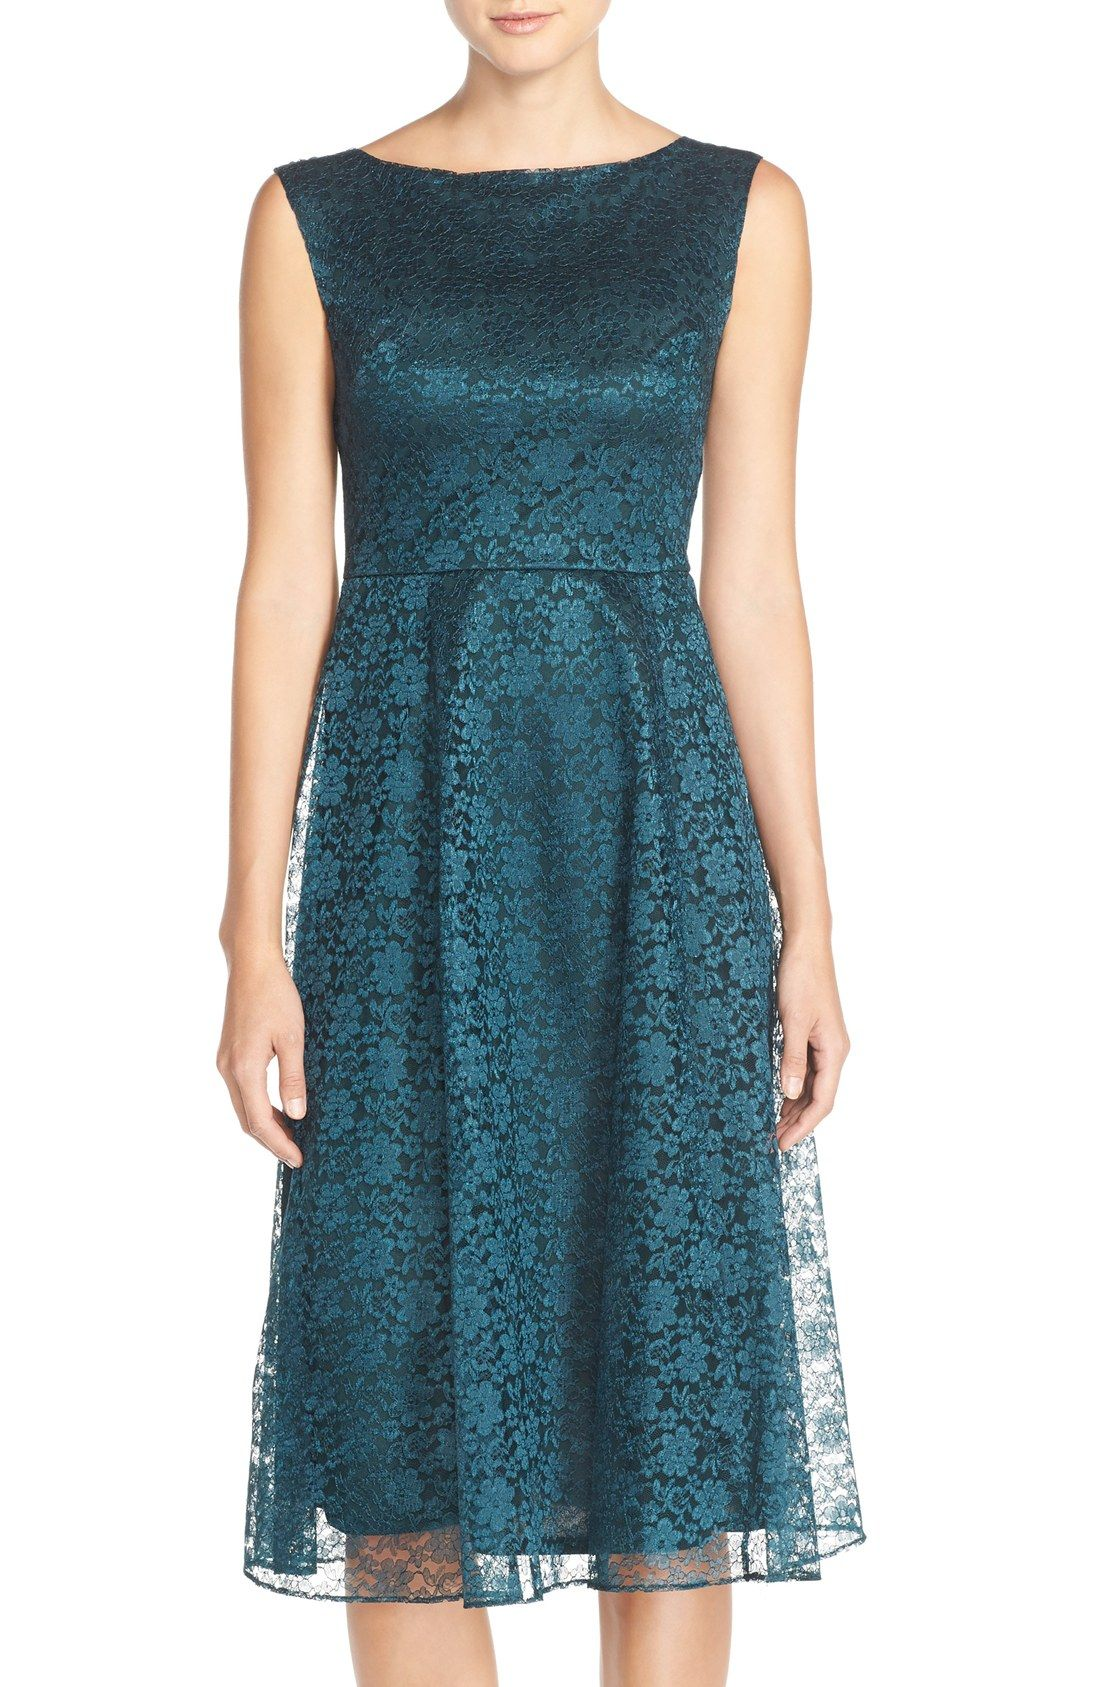 Betsey Johnson Lace Midi Fit & Flare Dress - \